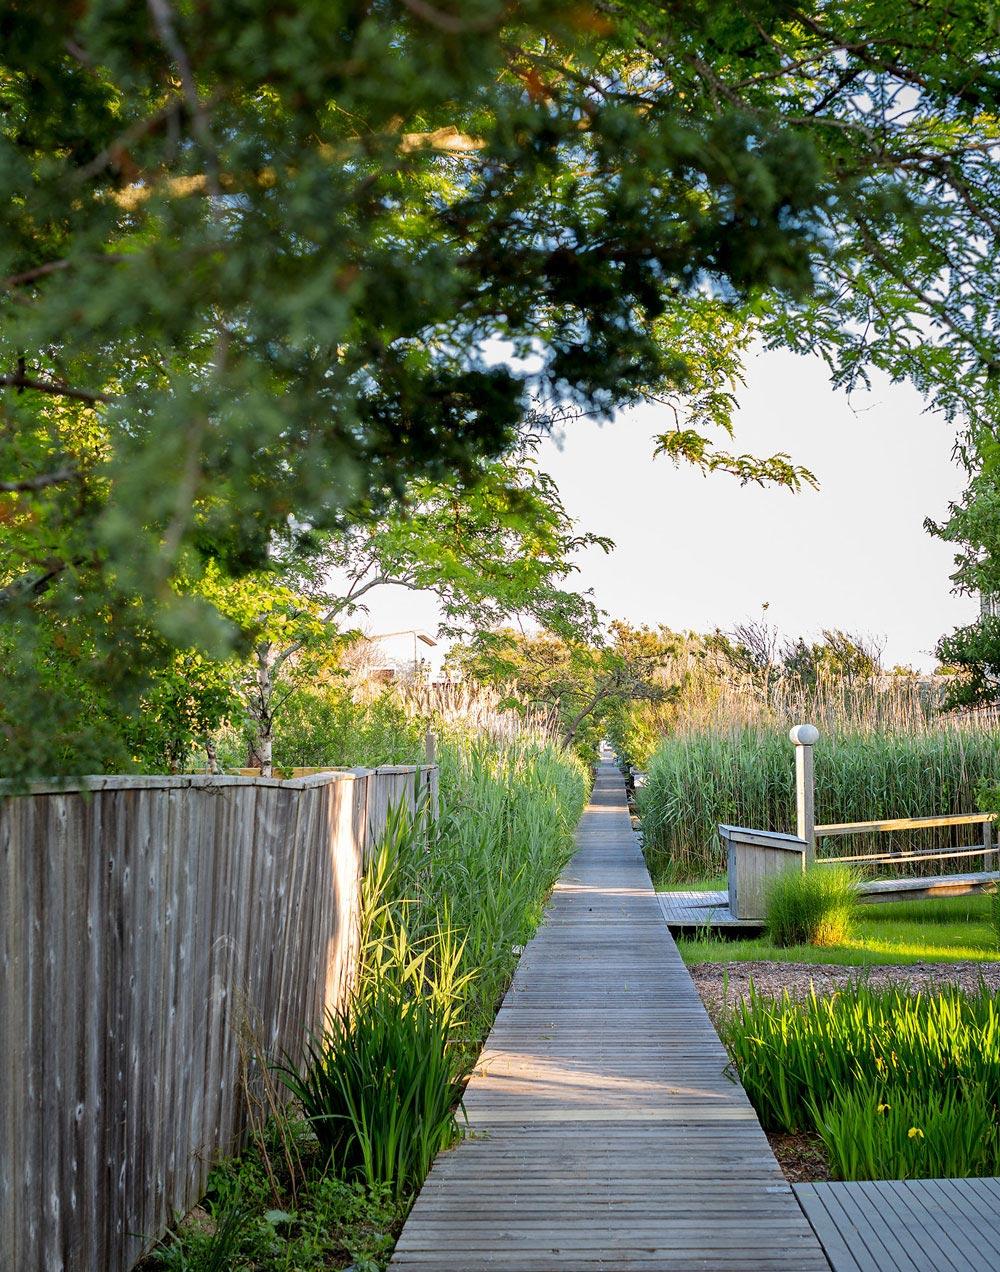 Wooden Pathway, Richard Meier's Fire Island House